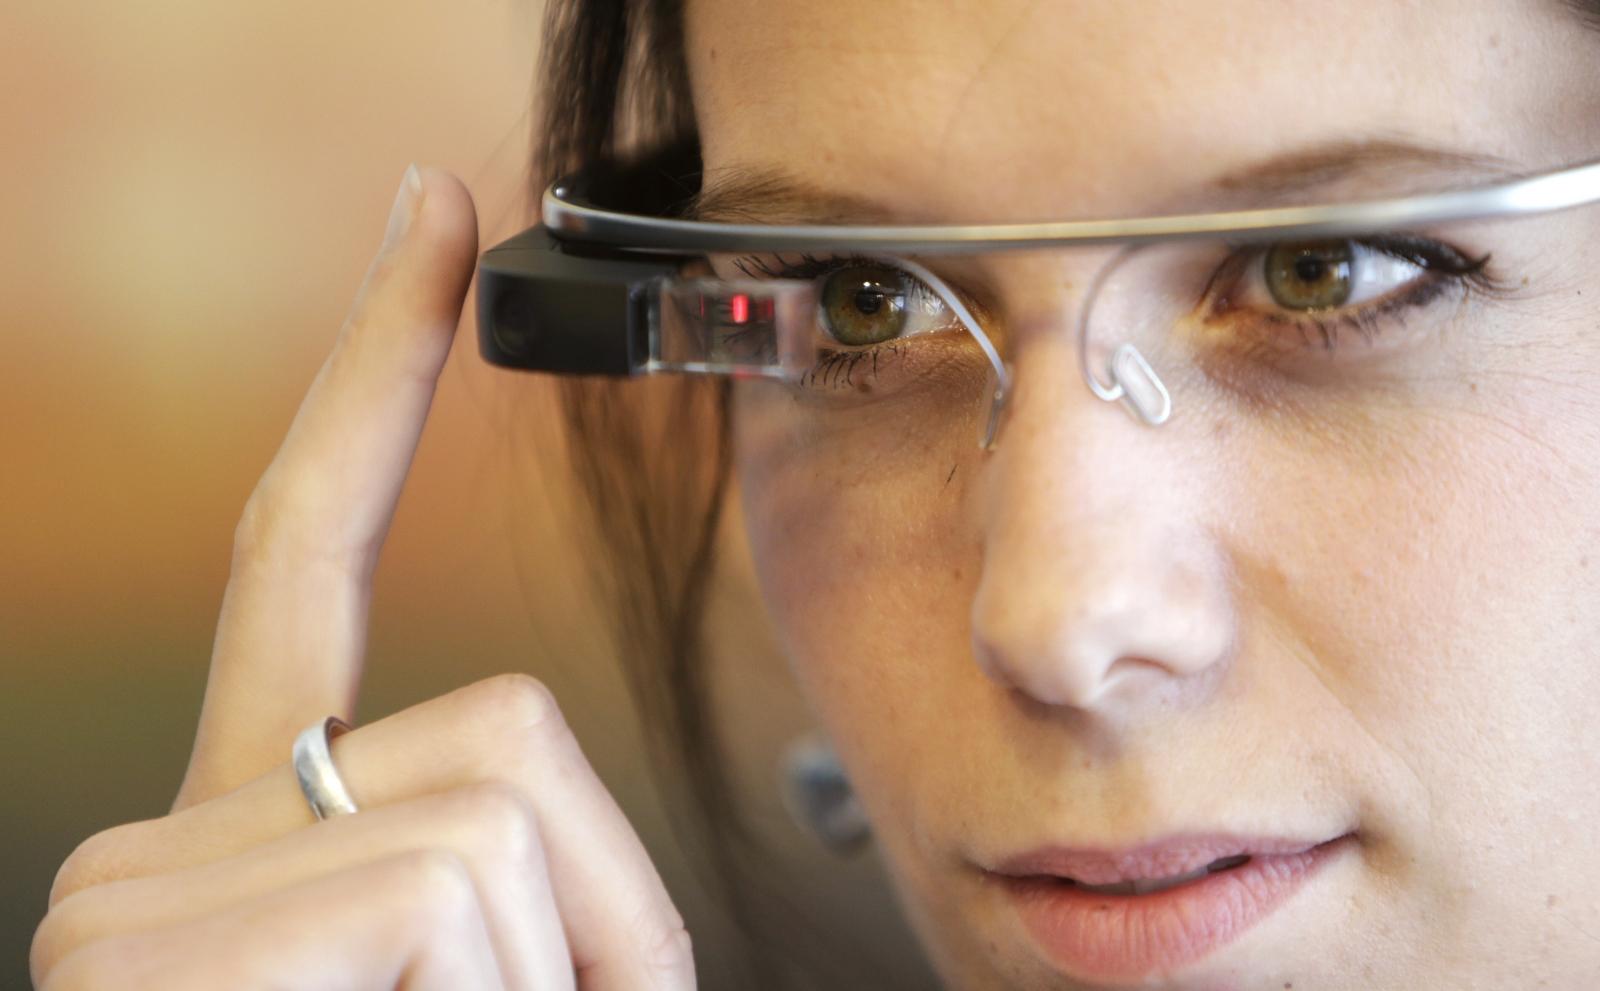 Google Glass device records memories